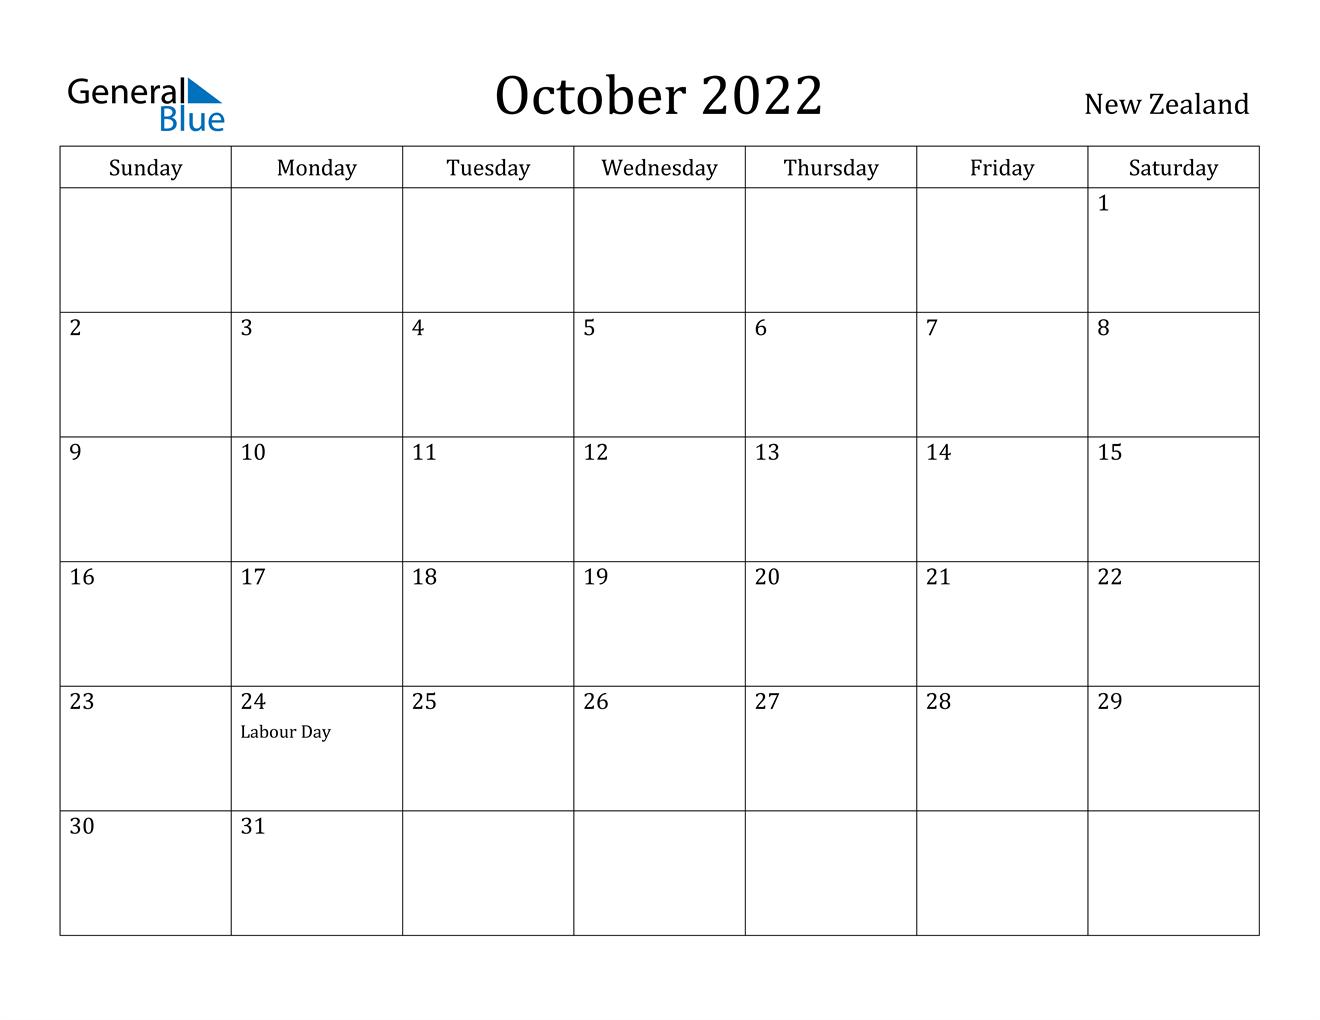 October 2022 Calendar - New Zealand